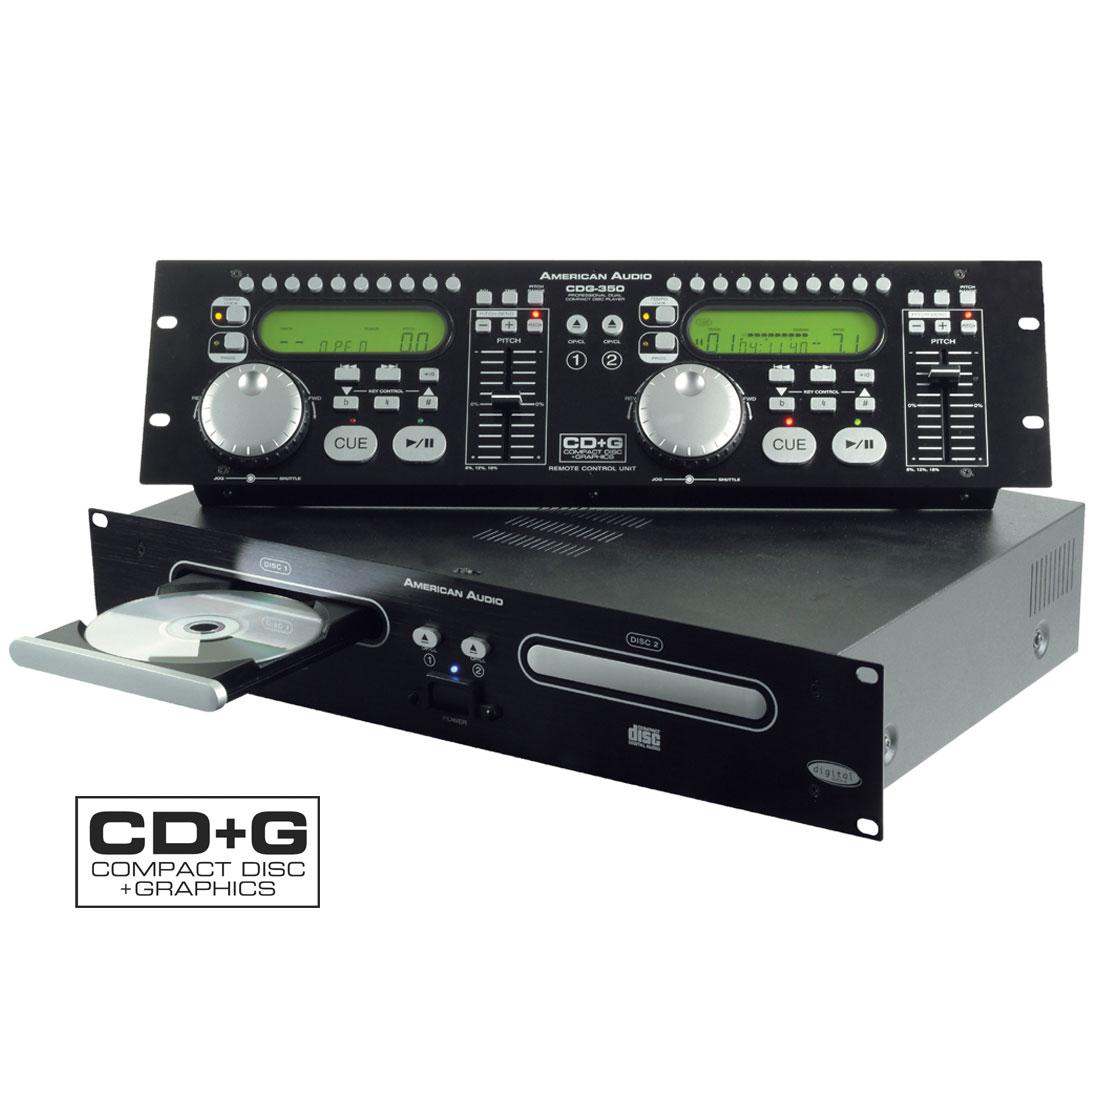 CDG350 dual CD/CDG player